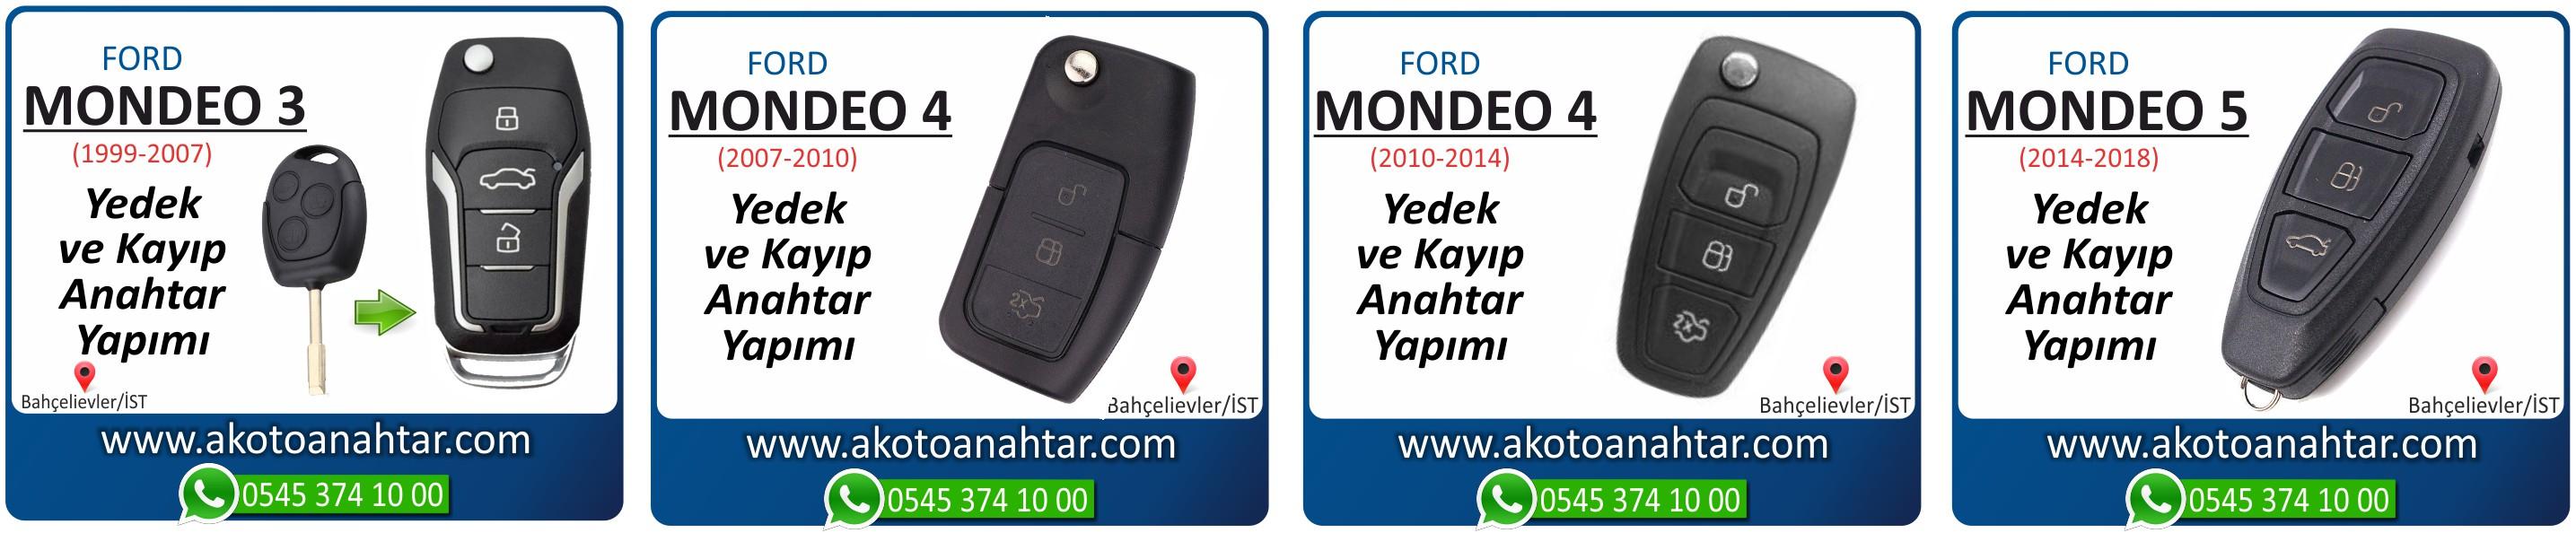 Mondeo anahtari - Ford Mondeo 4 Anahtarı | Yedek ve Kayıp Anahtar Yapımı